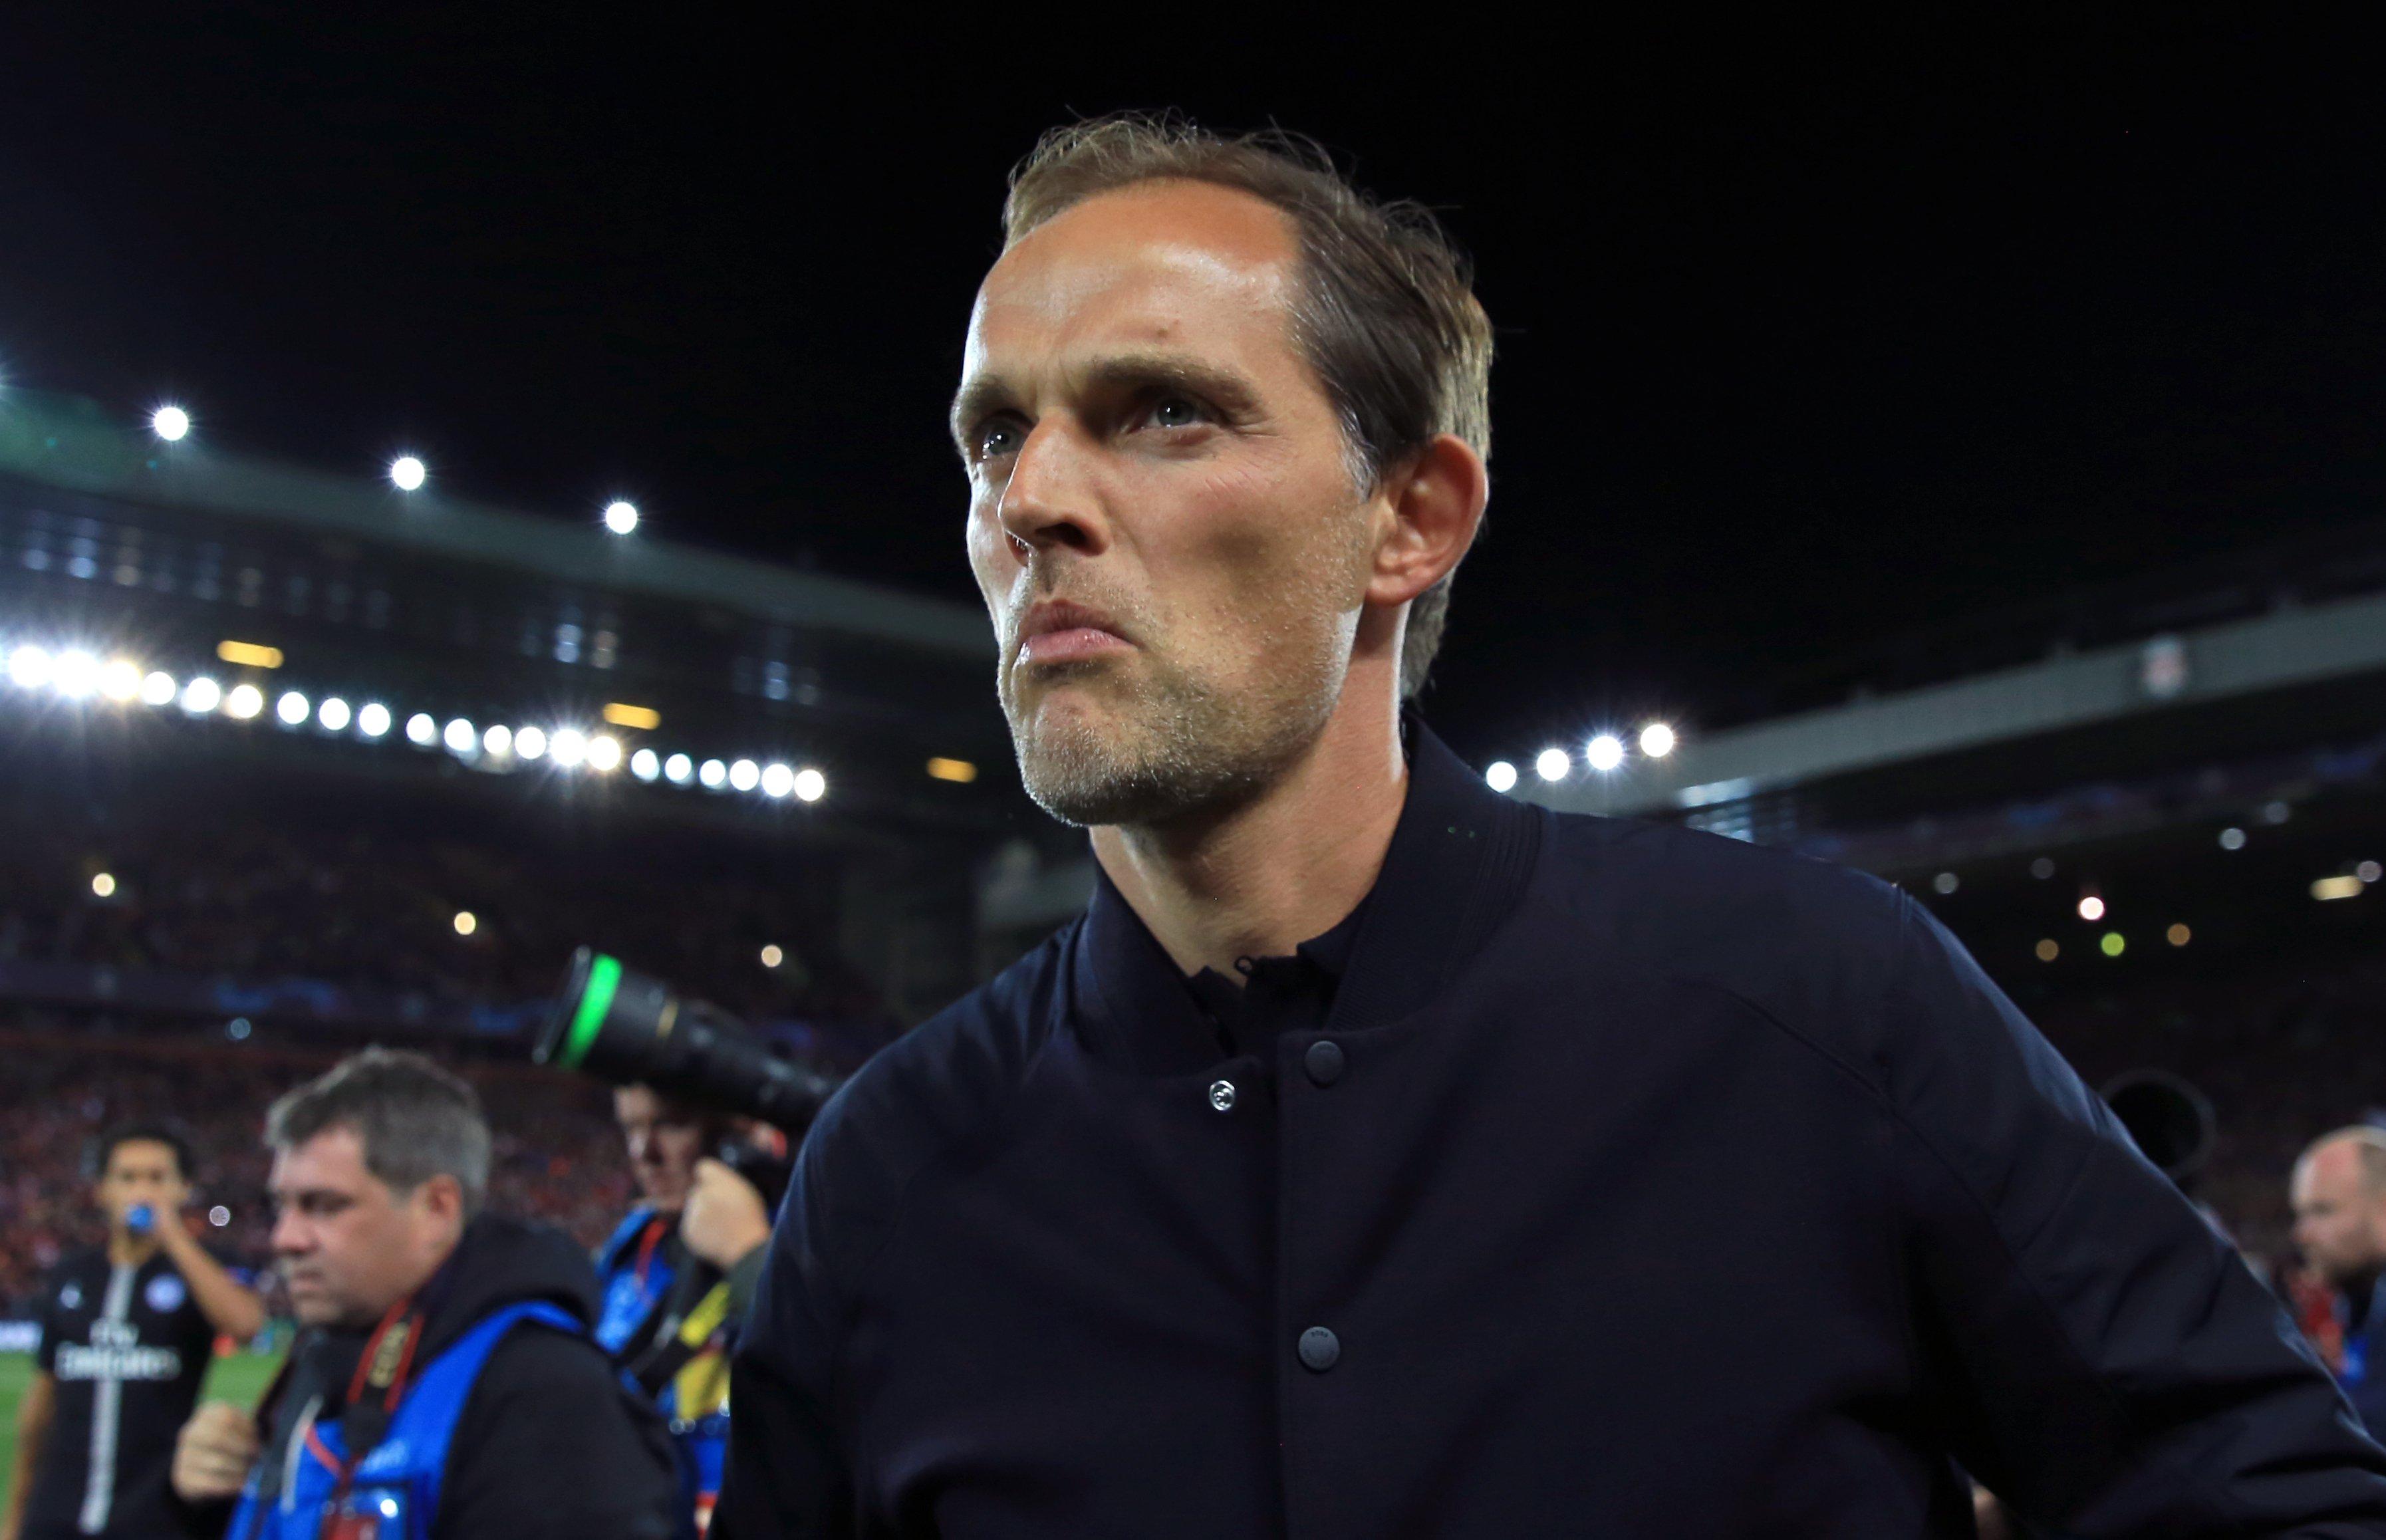 A closer look at the situation facing the new man at Stamford Bridge